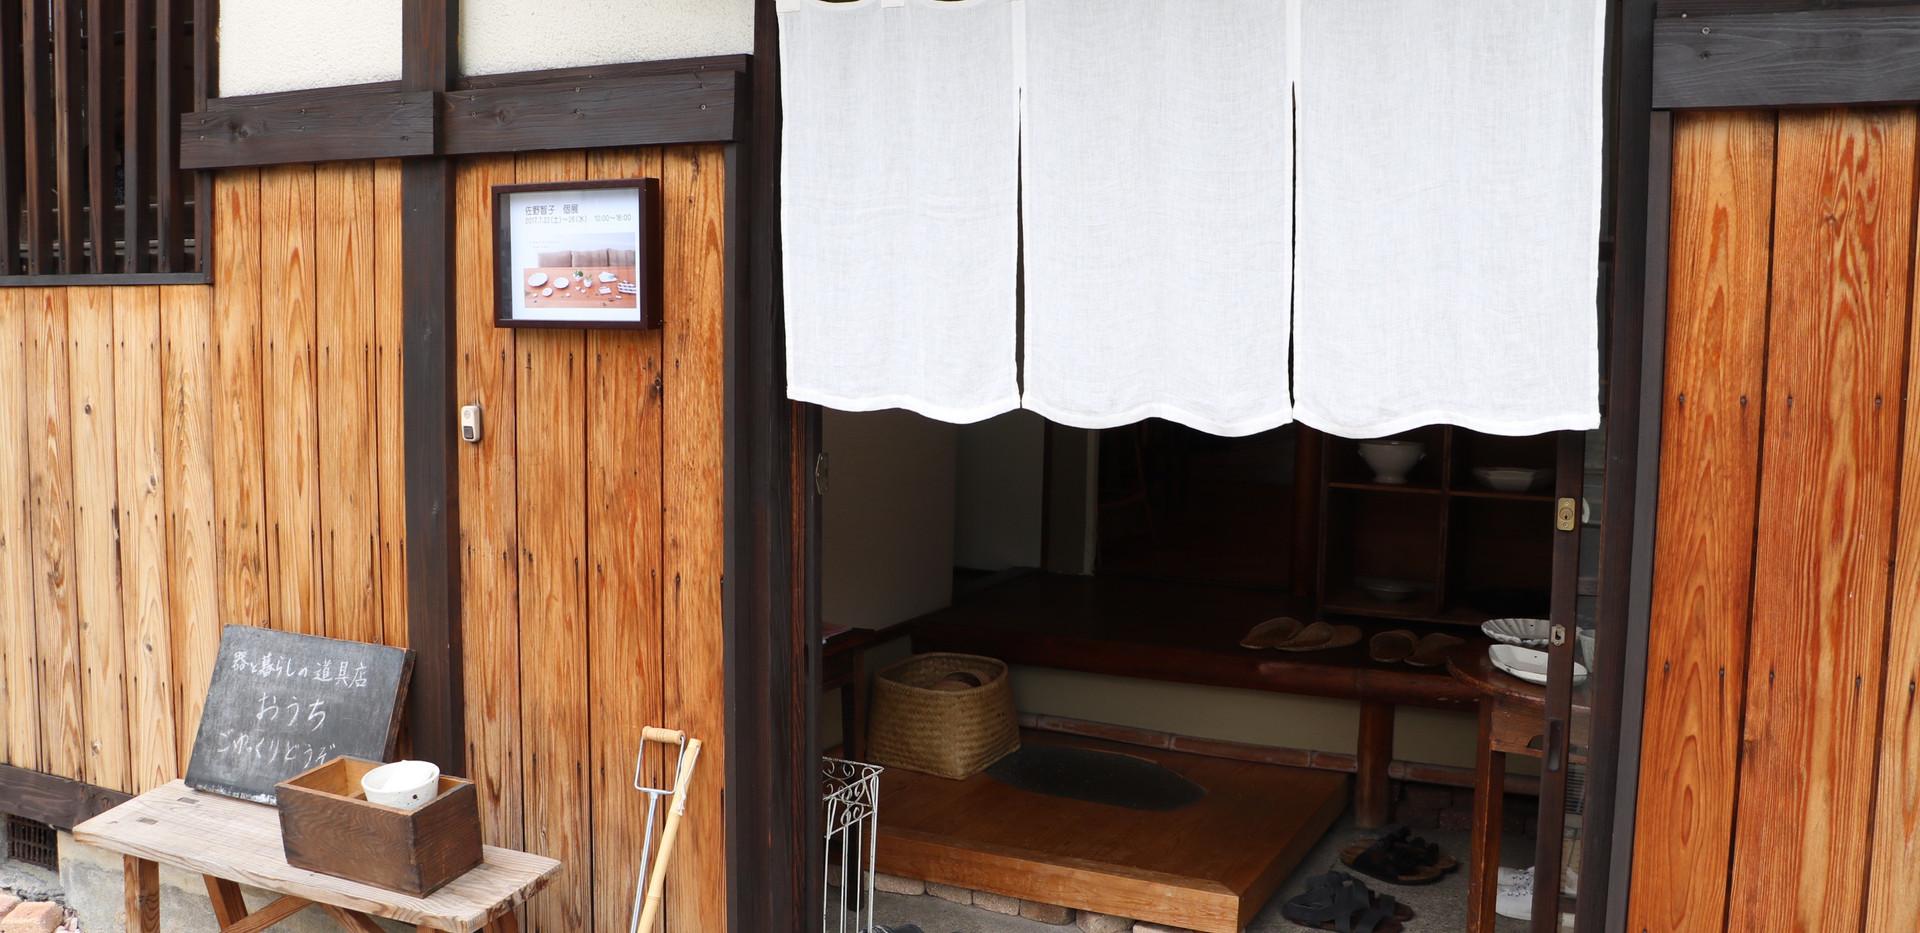 2017.7.22~26 Kyouto ouchi